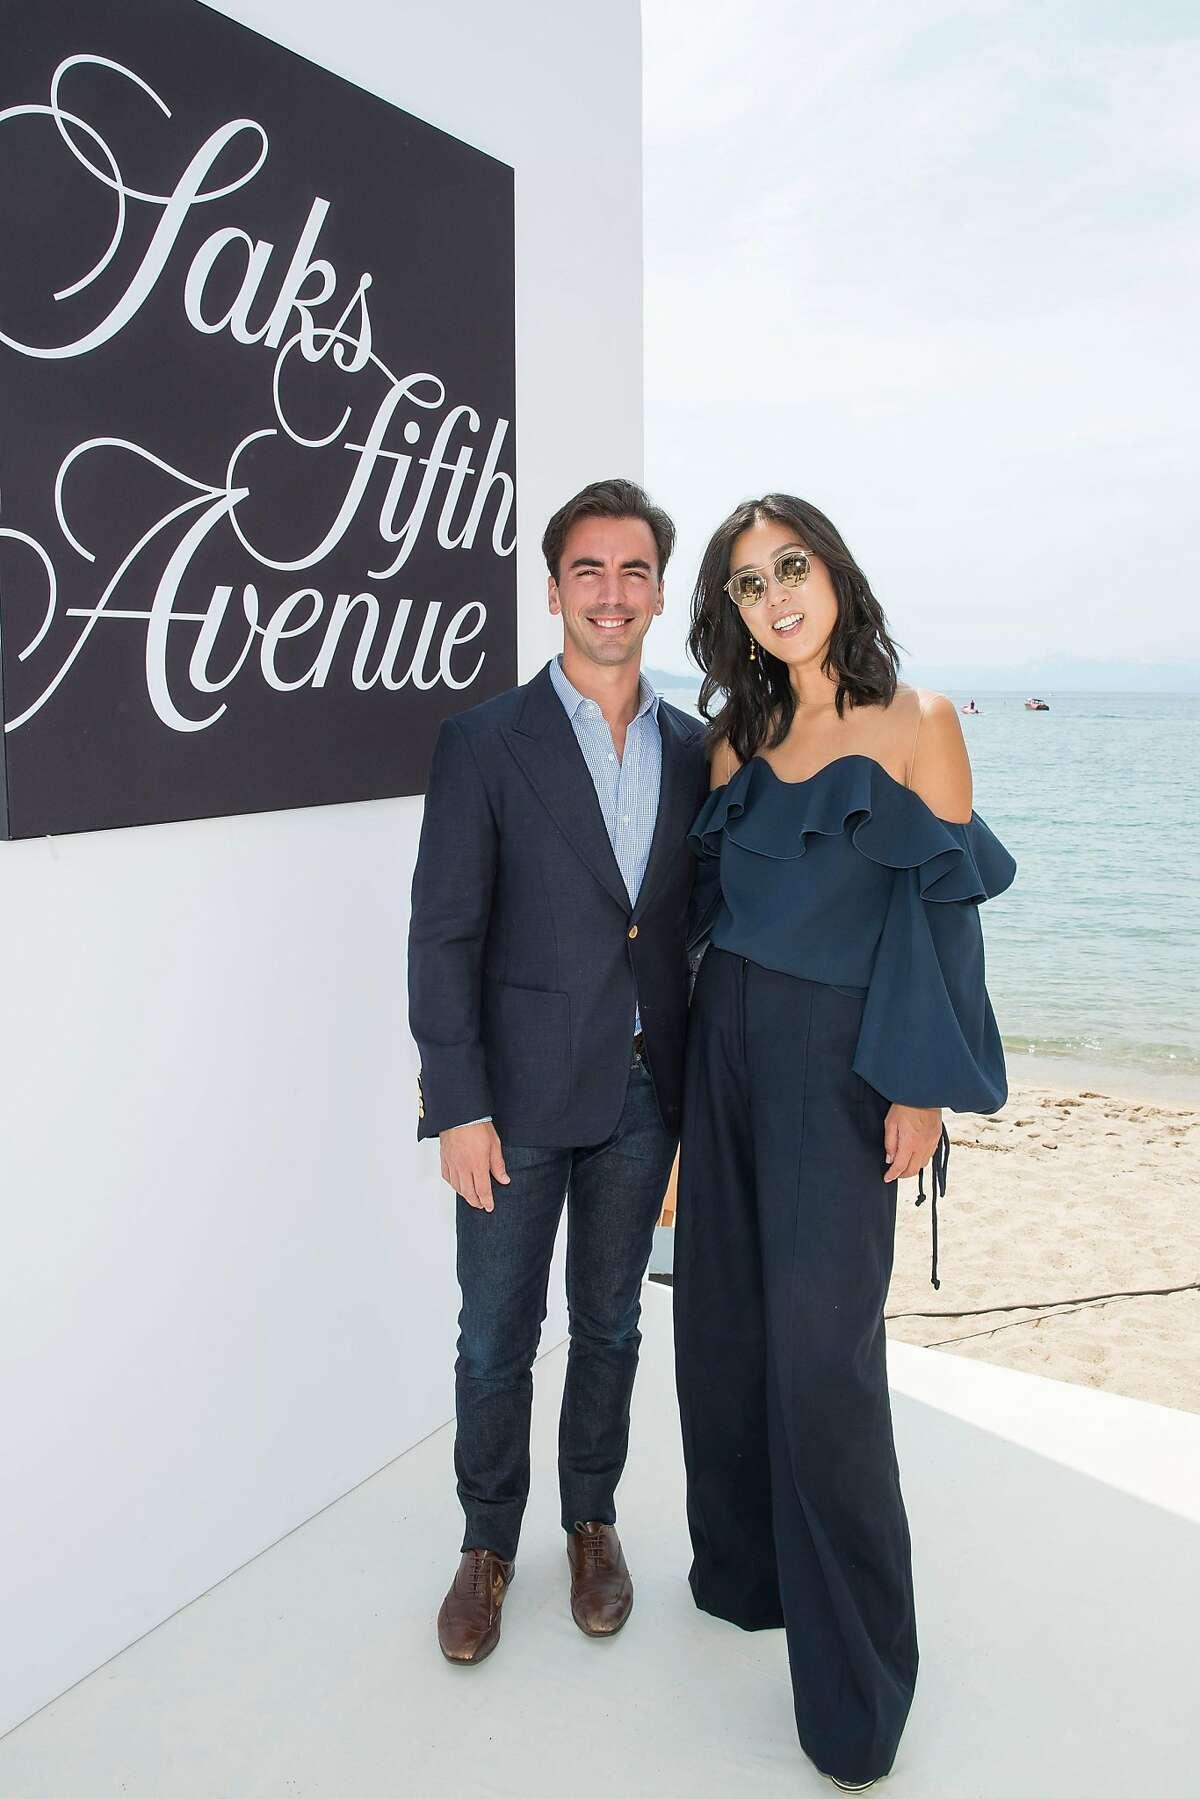 The League to Save Lake Tahoe fashion show with Saks Fifth Avenue and Oscar de la Renta raised $1.1 million Aug. 5, 2017 to keep Tahoe blue.